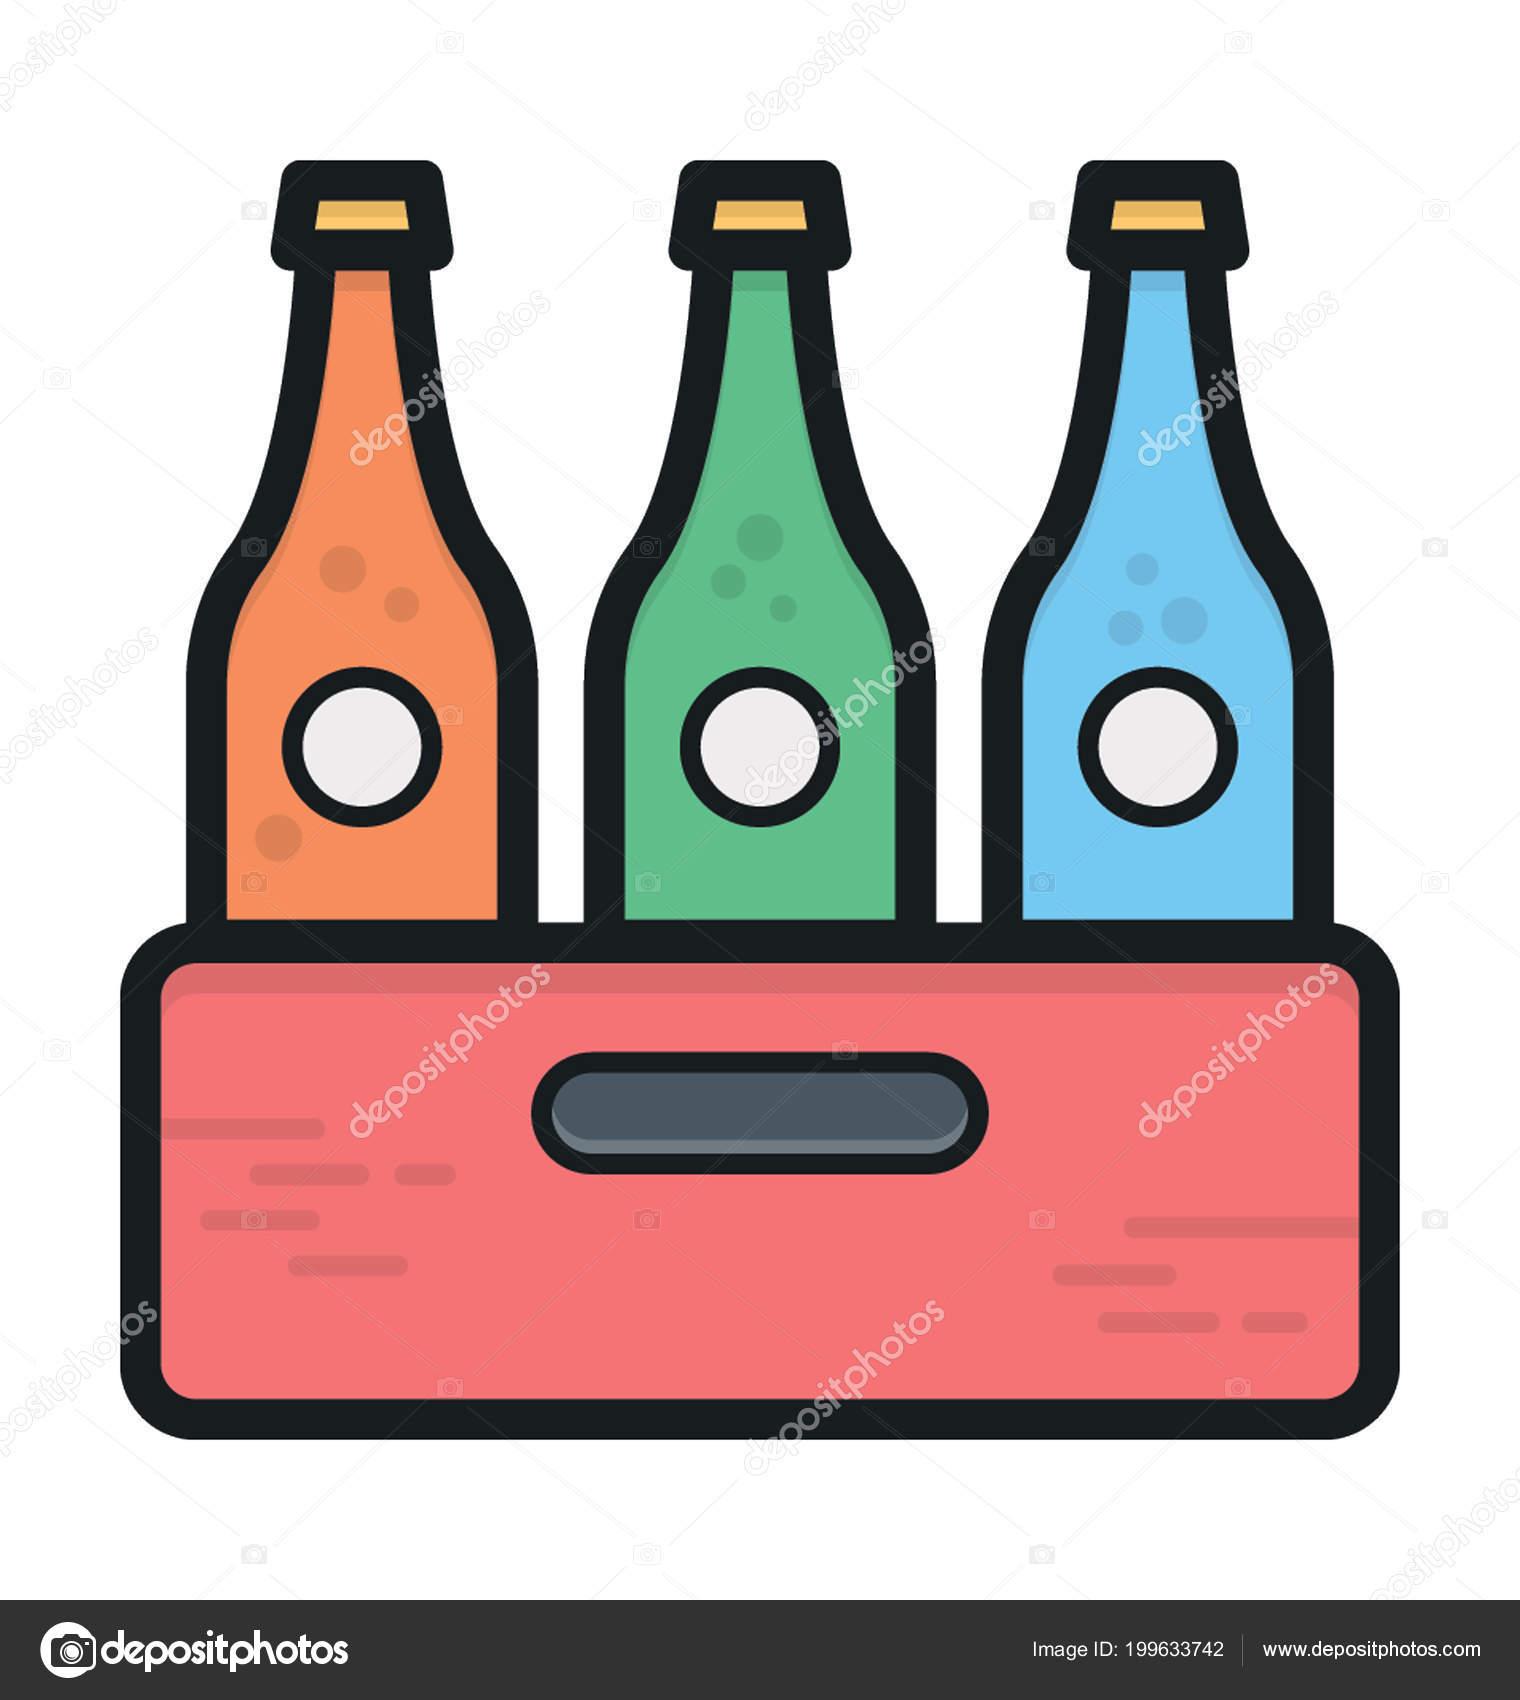 flaschen kiste farbigen vektor icon — stockvektor © creativestall